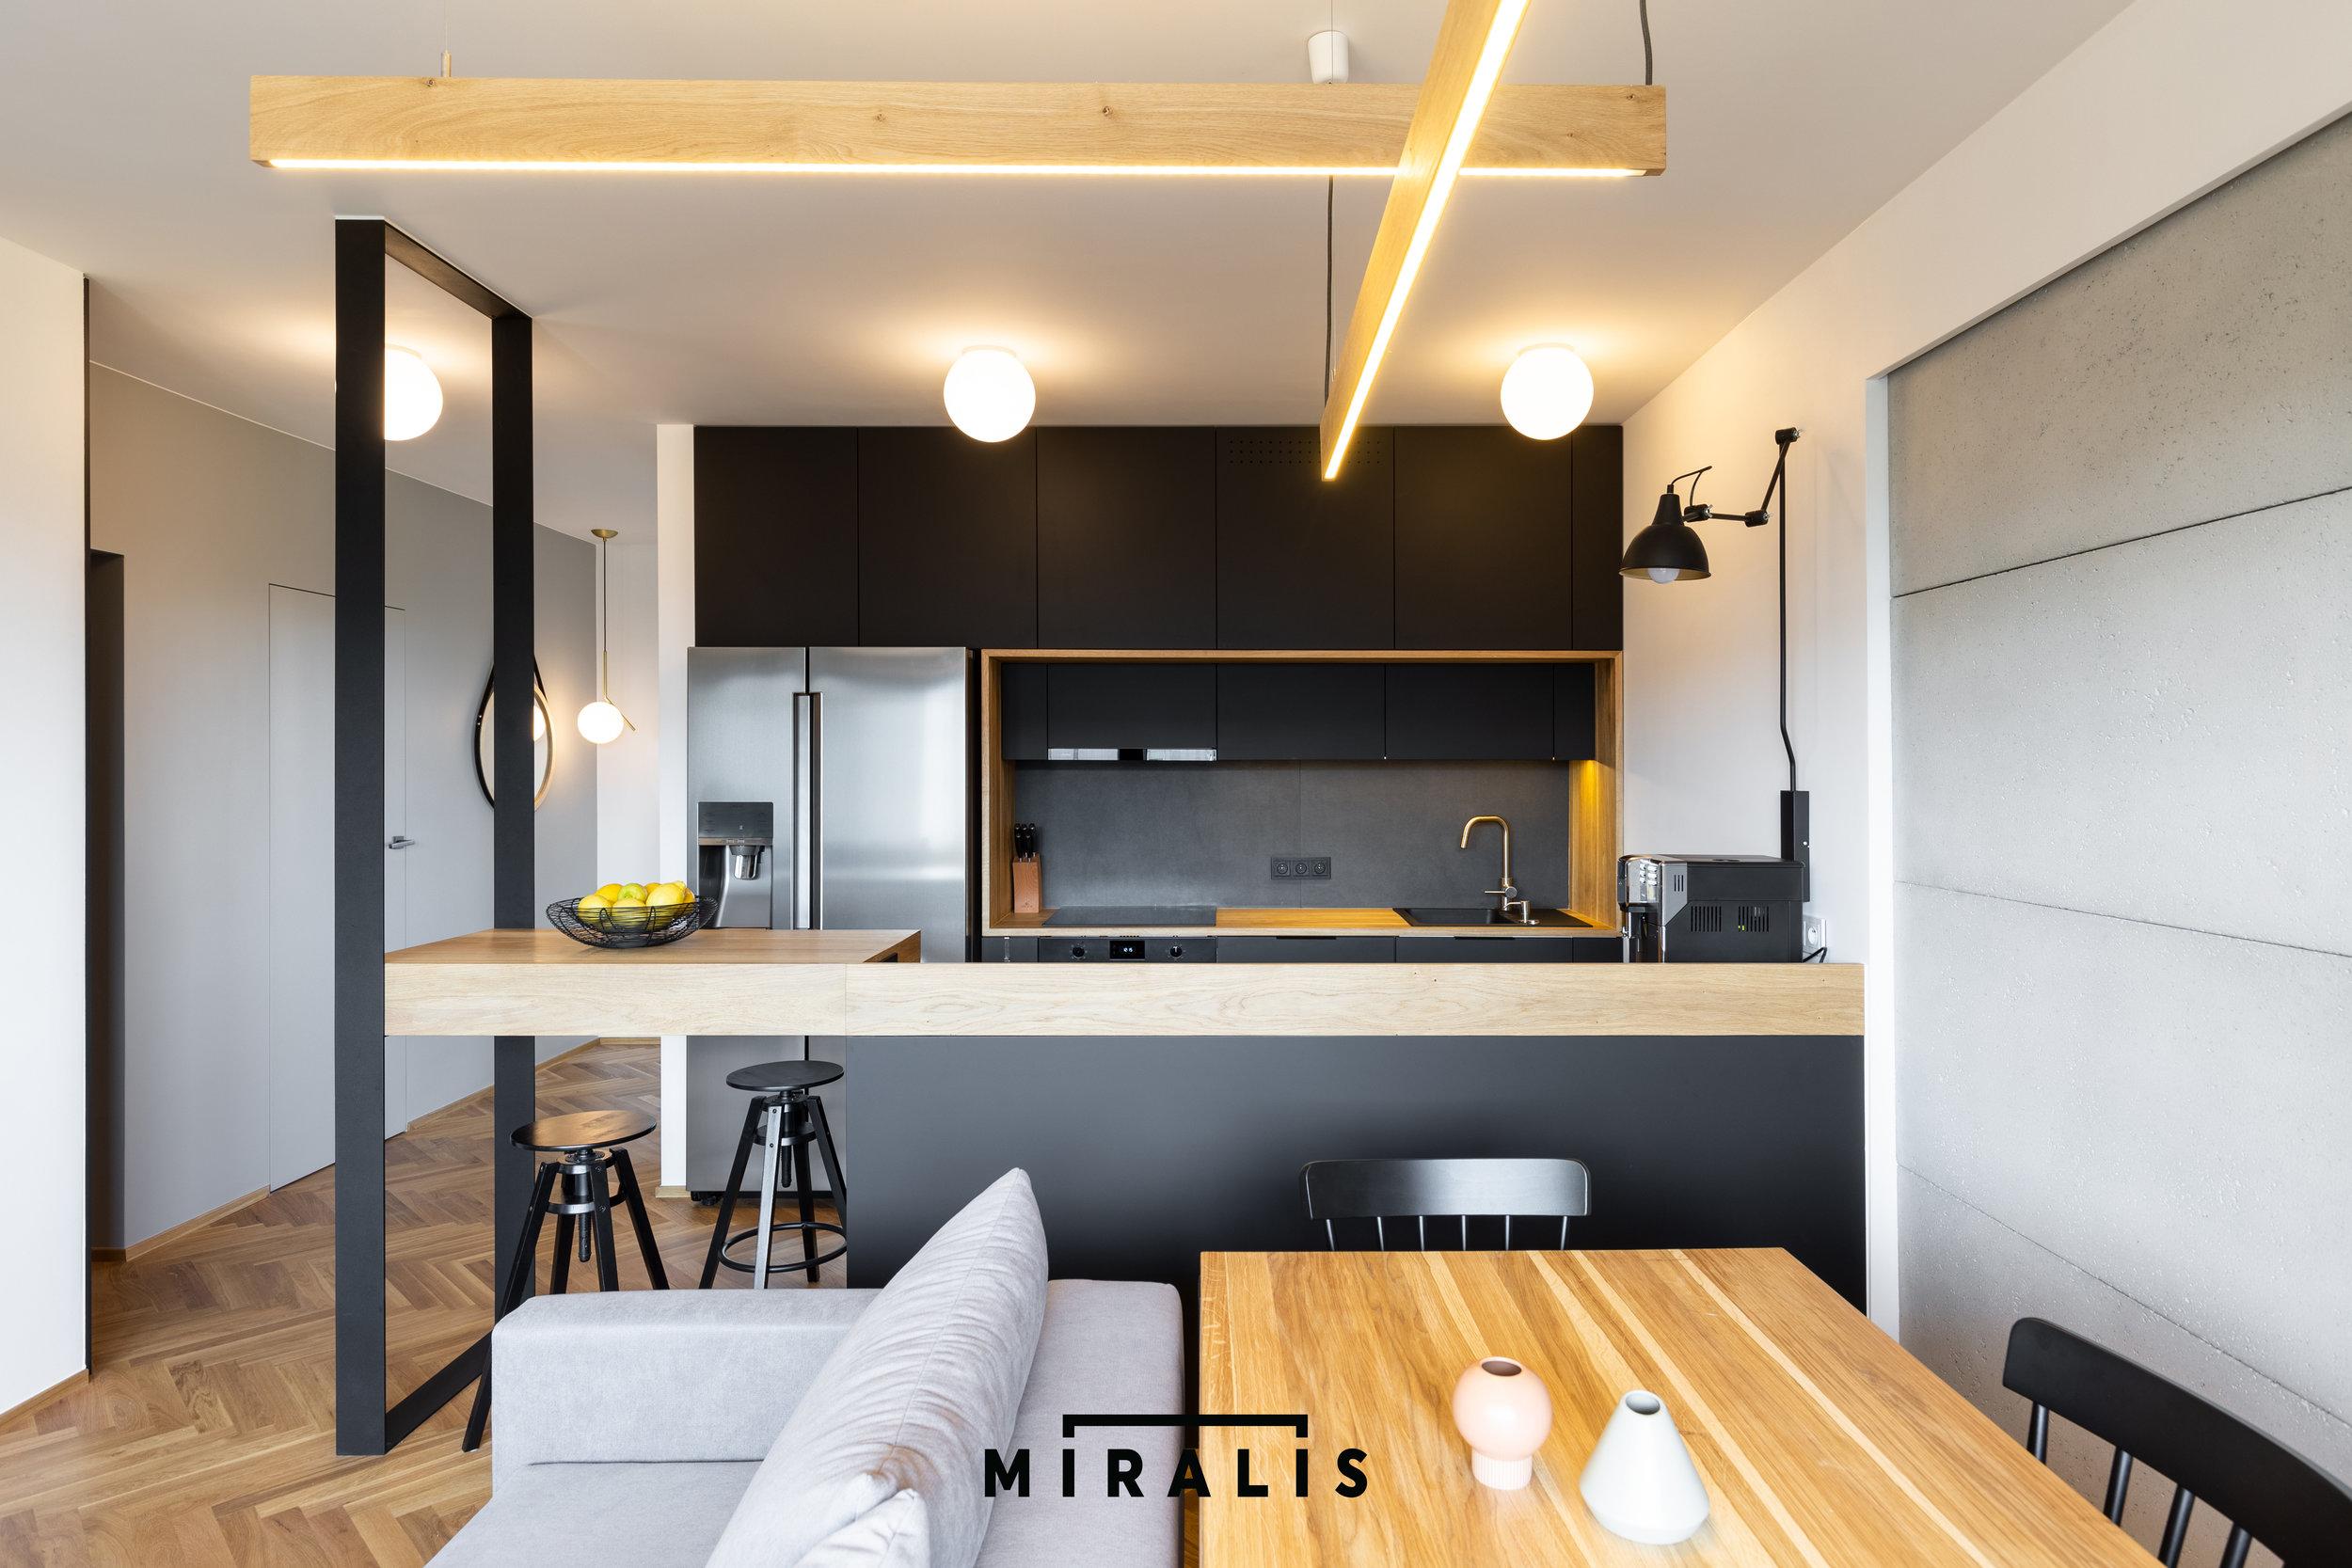 Miralis_01.jpg